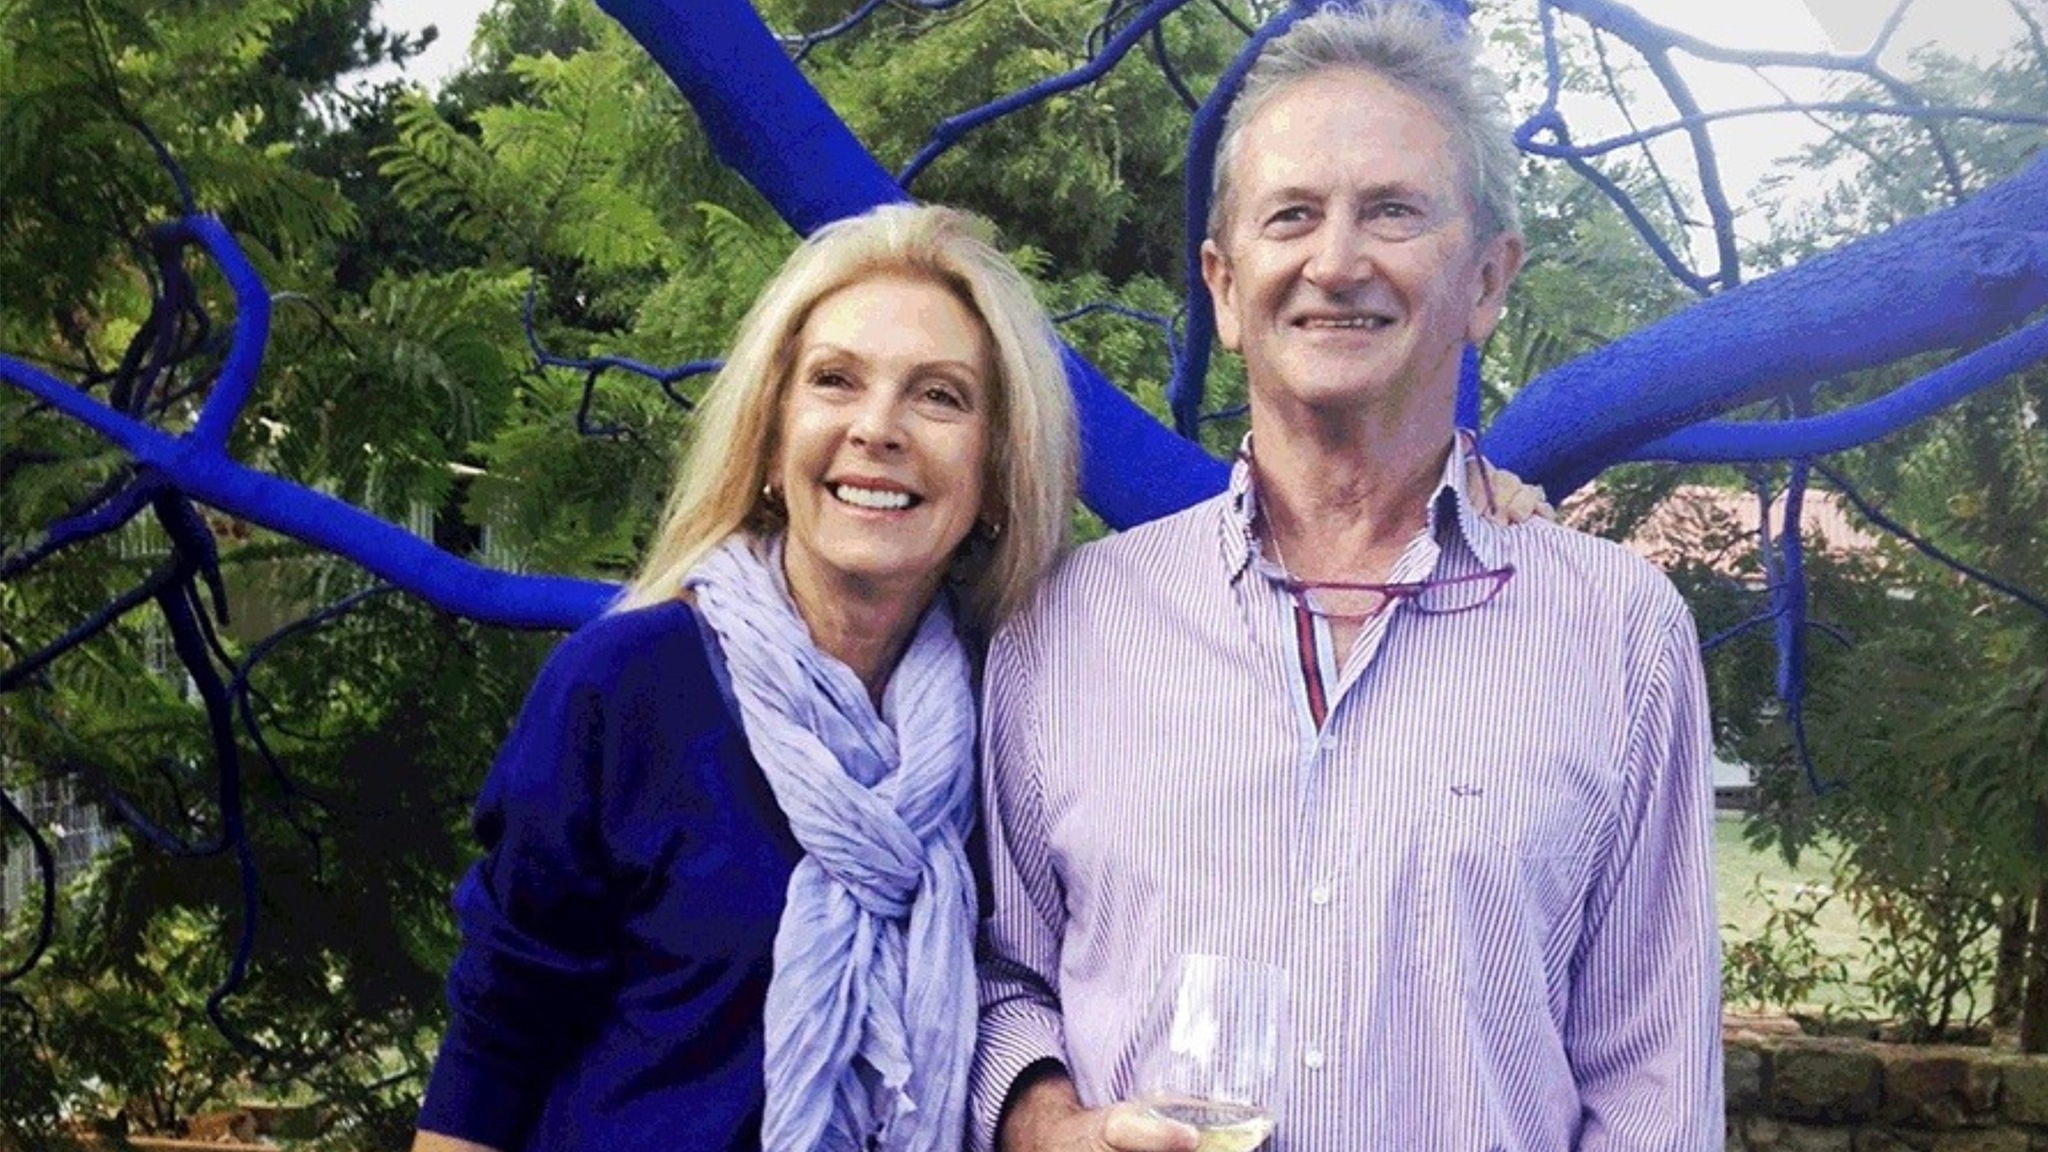 Tony and Cathie Hancy, Biodynamic Pioneers at Prancing Horse Estate